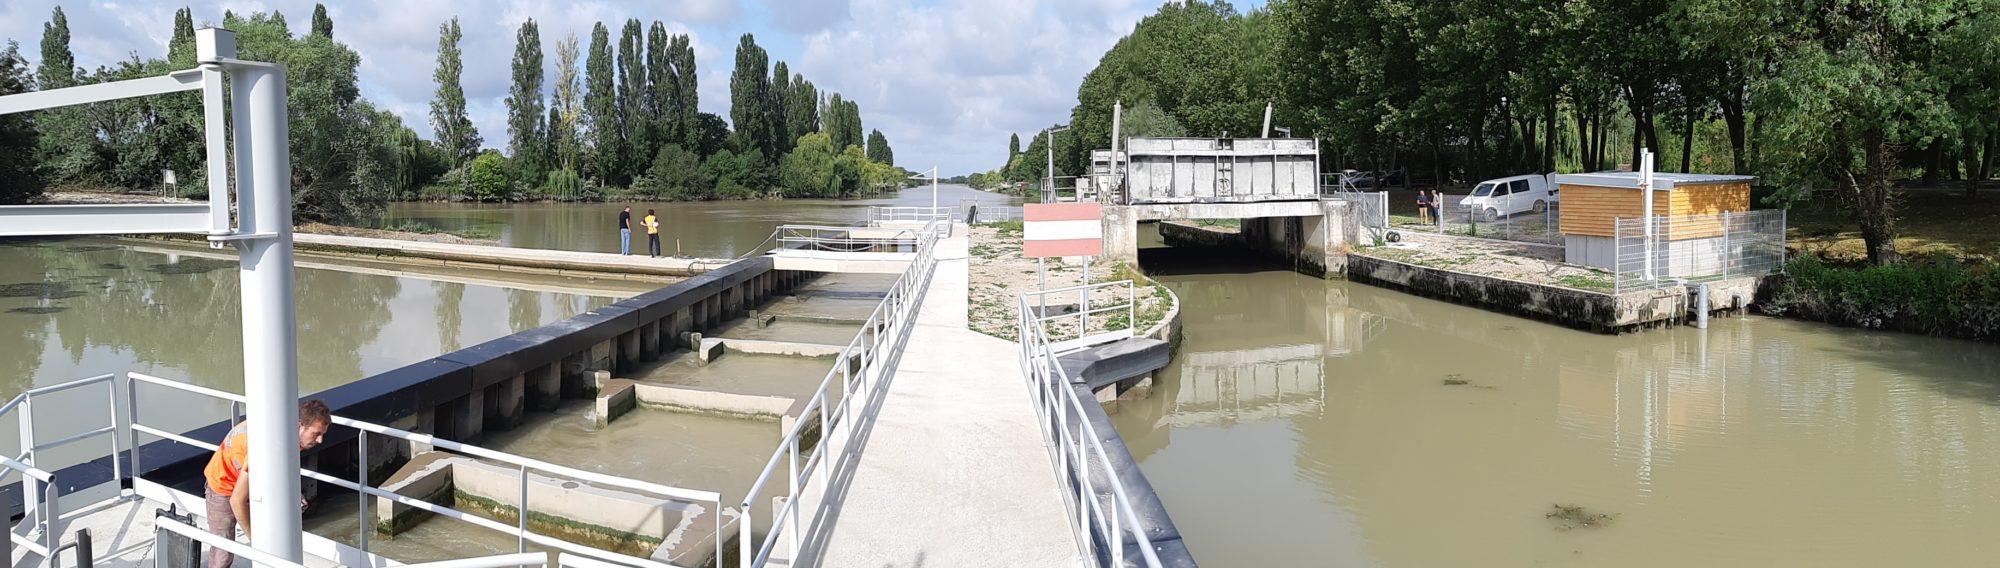 Passe à Poissons Saint-Savinien